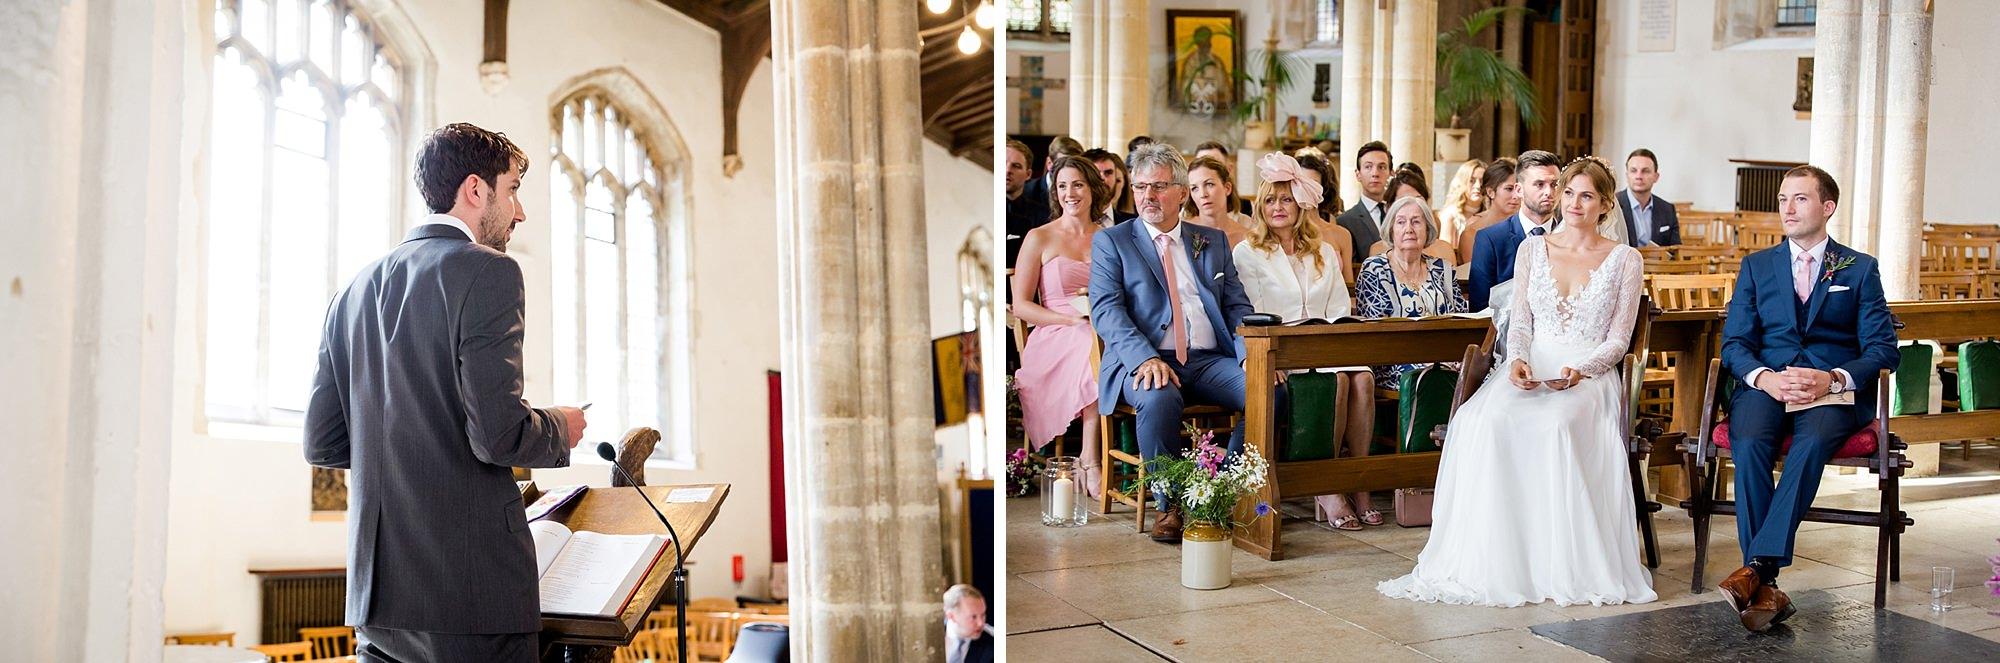 Marks Hall Estate wedding photography wedding reading